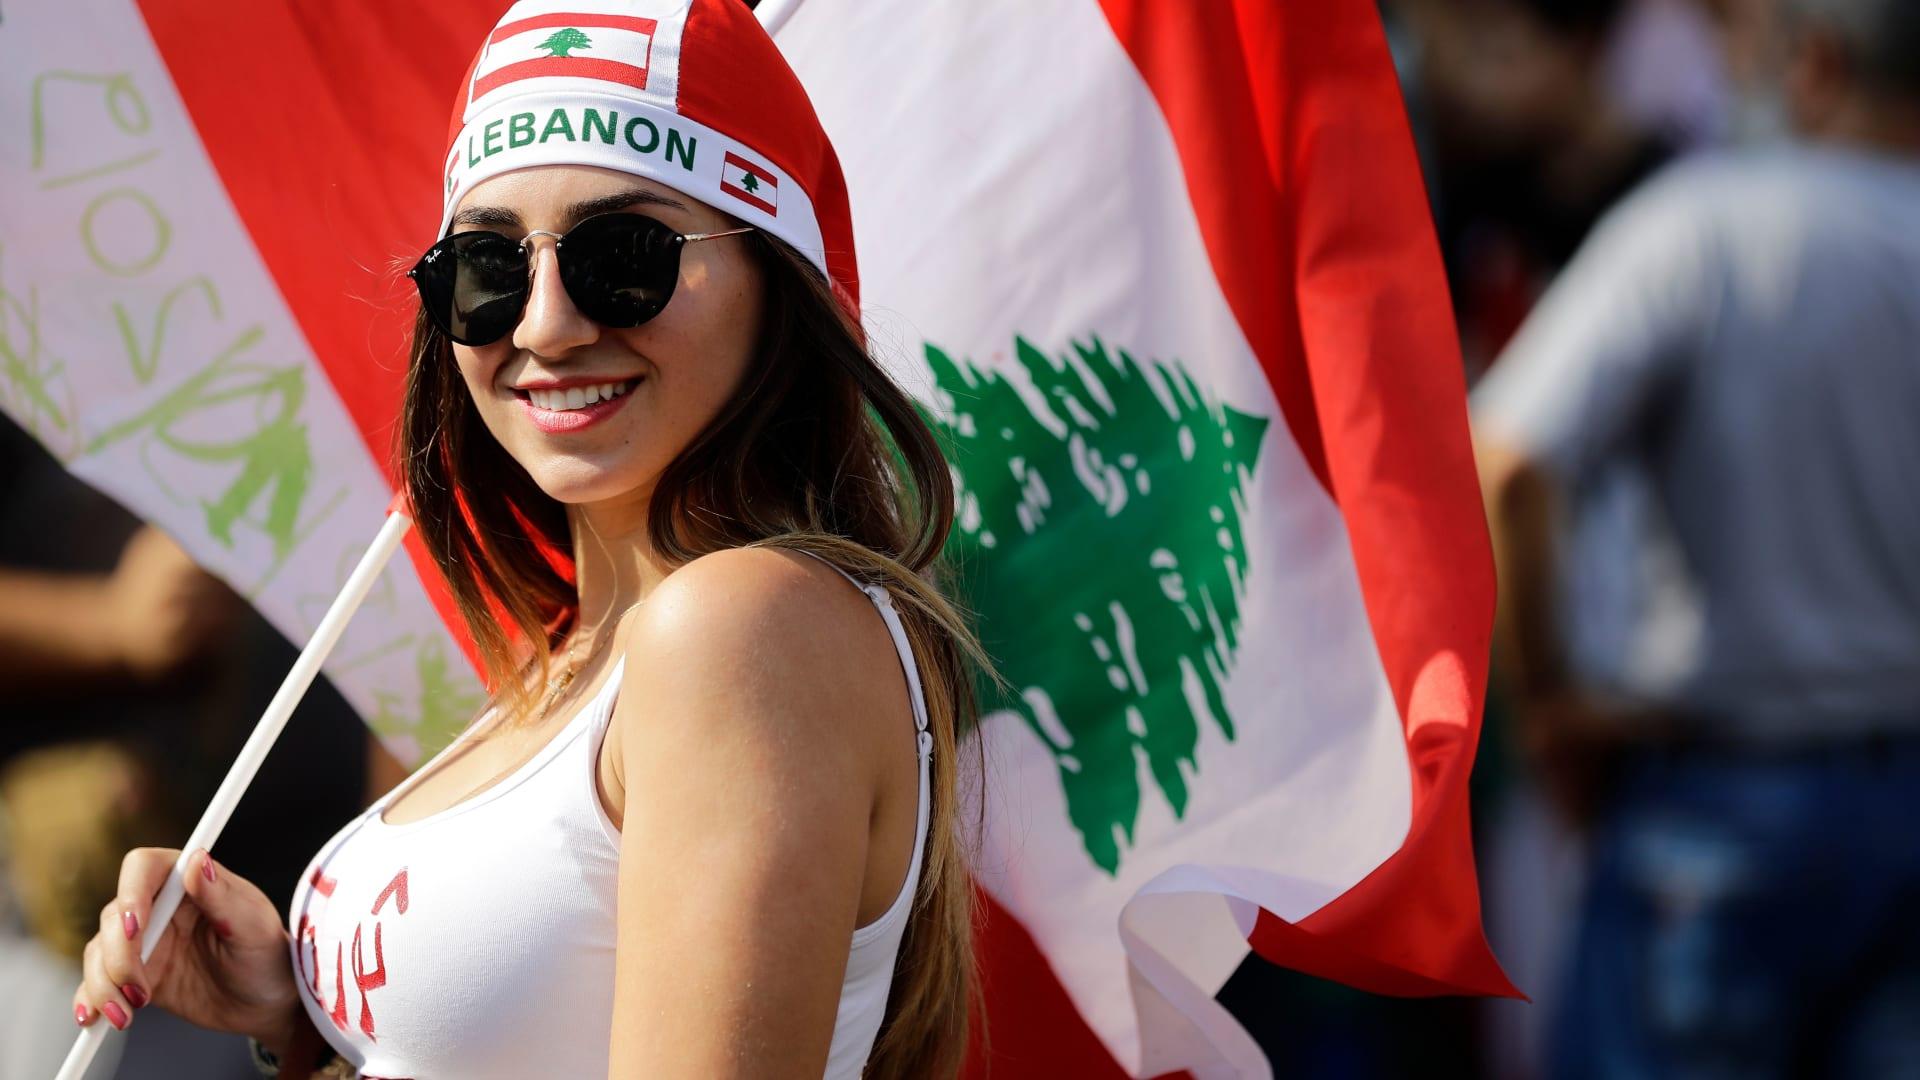 بيومها الثالث.. ما آخر تطورات مظاهرات لبنان؟